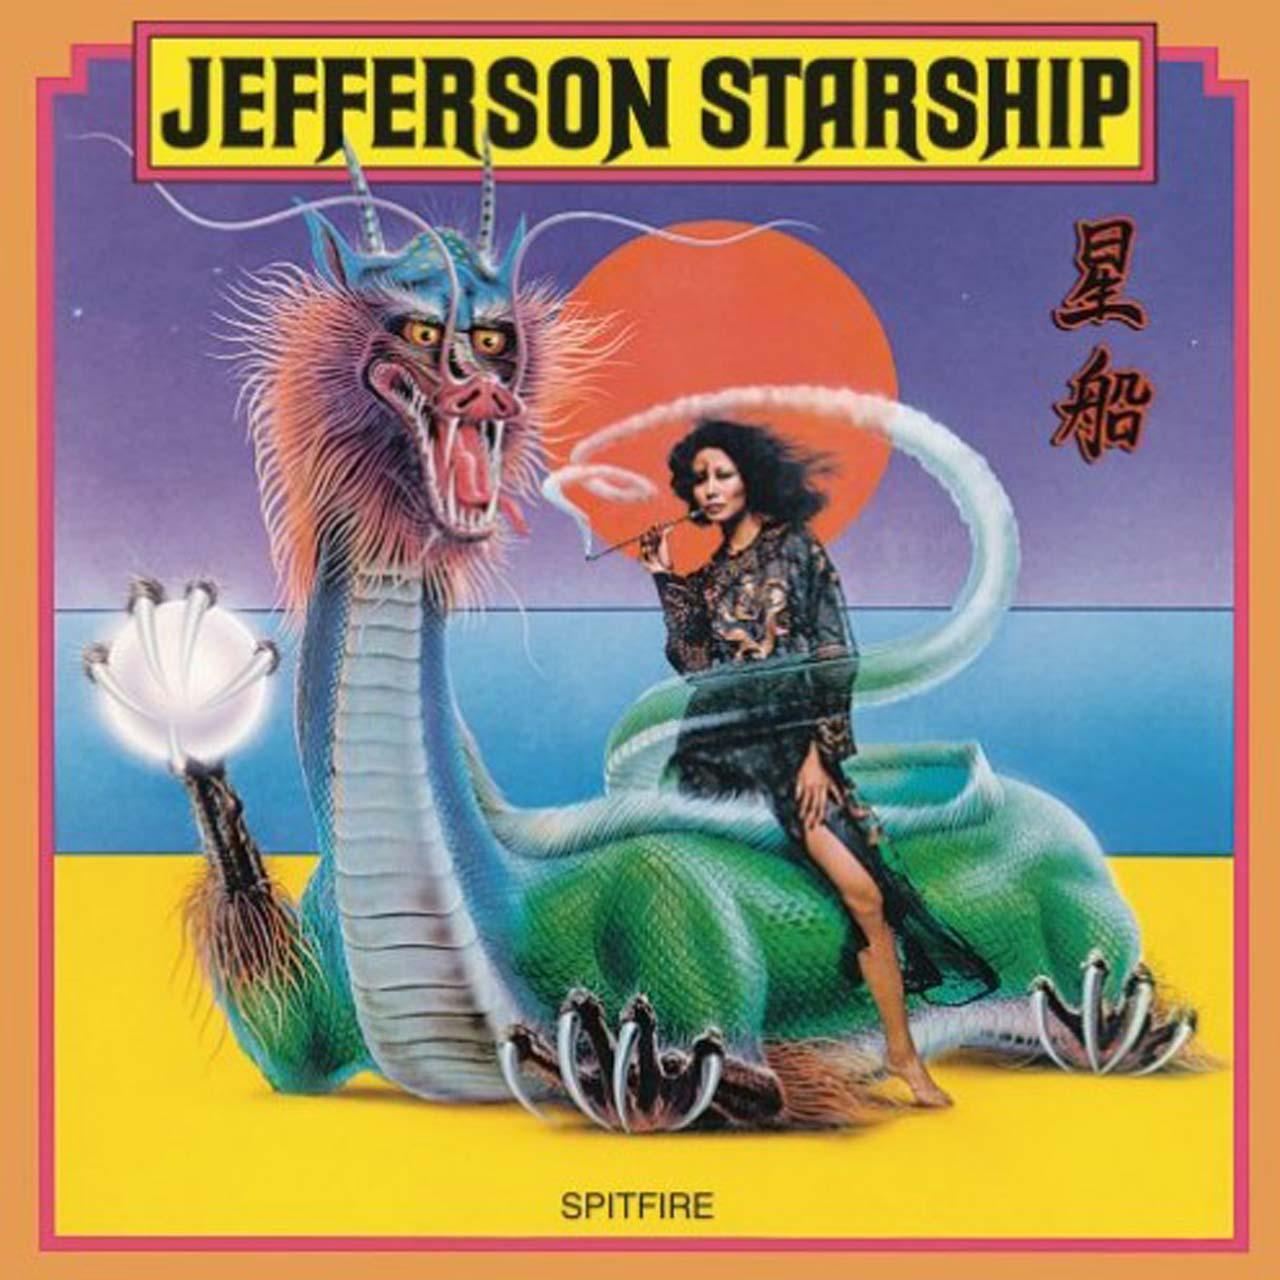 Sushei Nagaoka / Illustration Maestro - Jefferson Starship - Spitfire